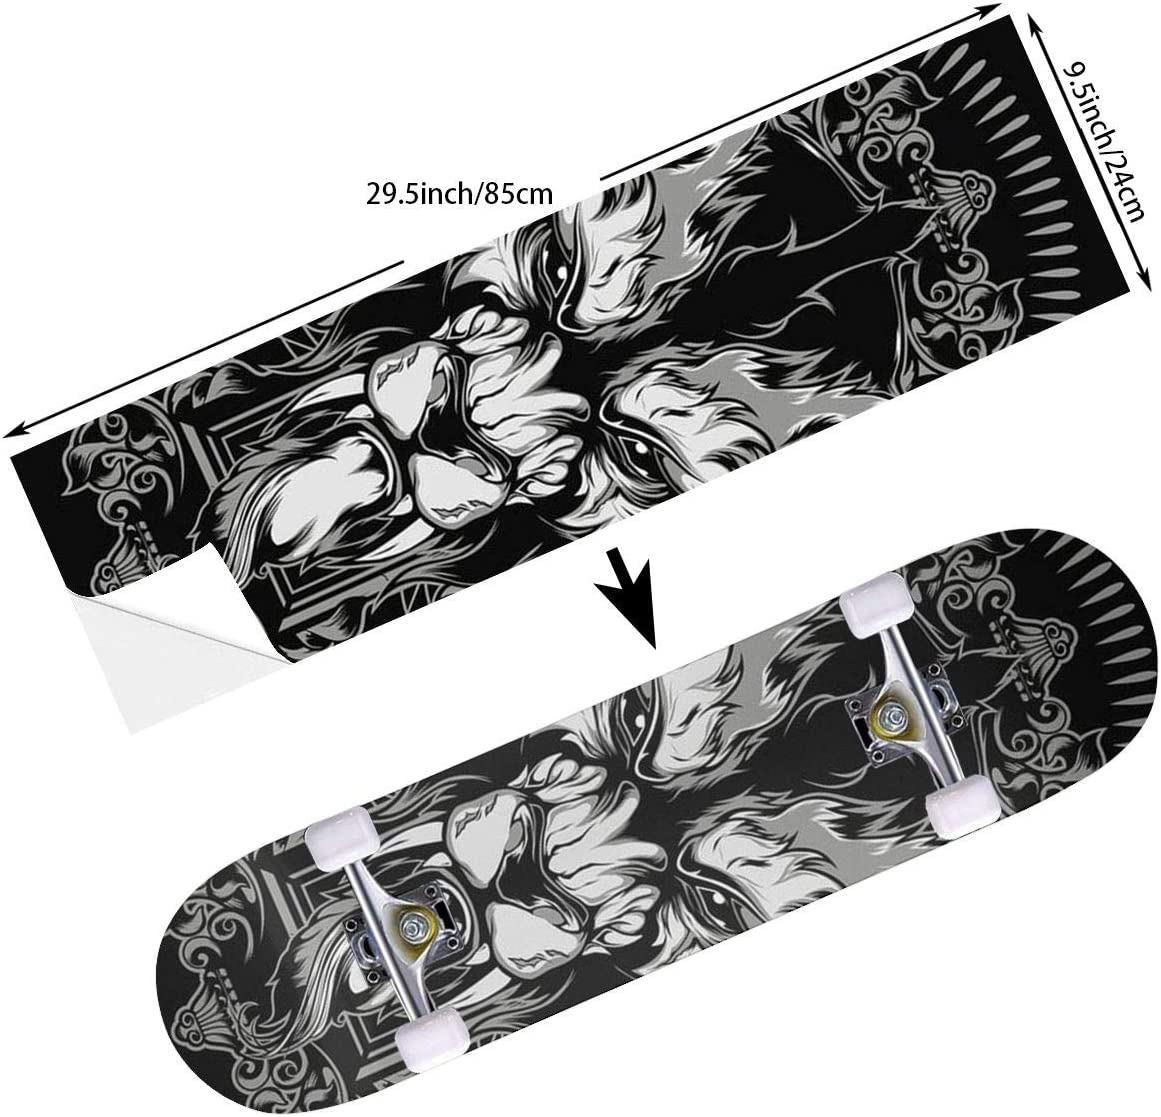 9.5 x 33.5 Inches STREET FFX Skateboard Cruiser Deck and Balance Board Stickers Decals